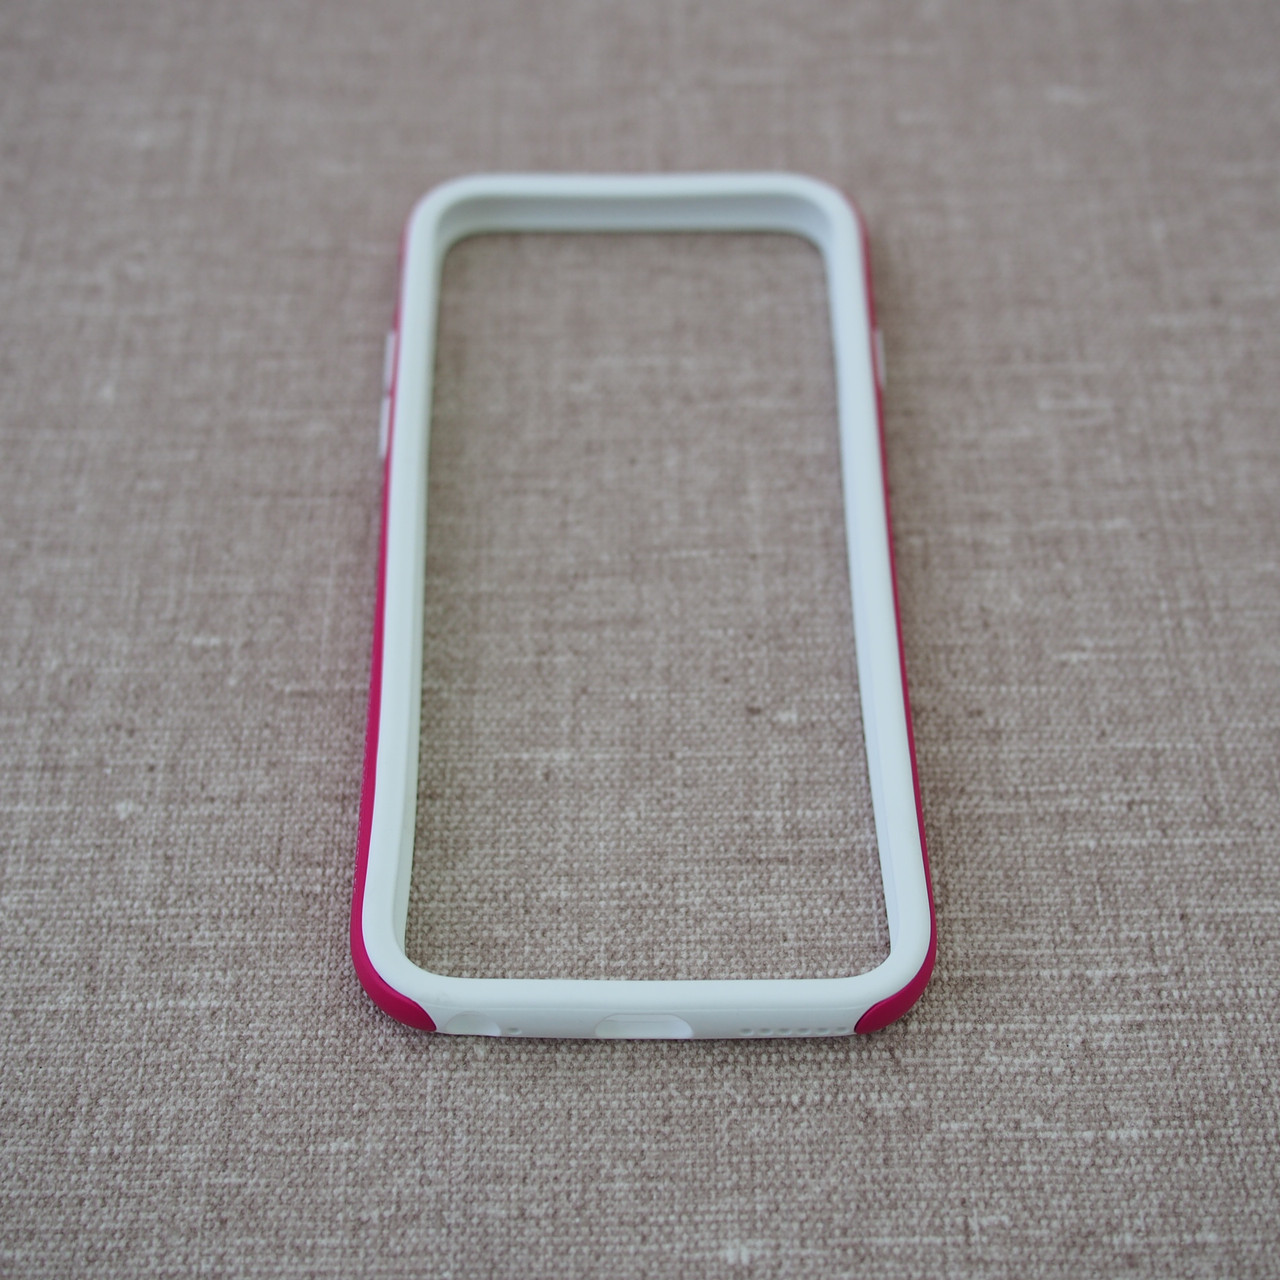 Бампер Araree iPhone 6 pink/white EAN/UPC: 8809354947984